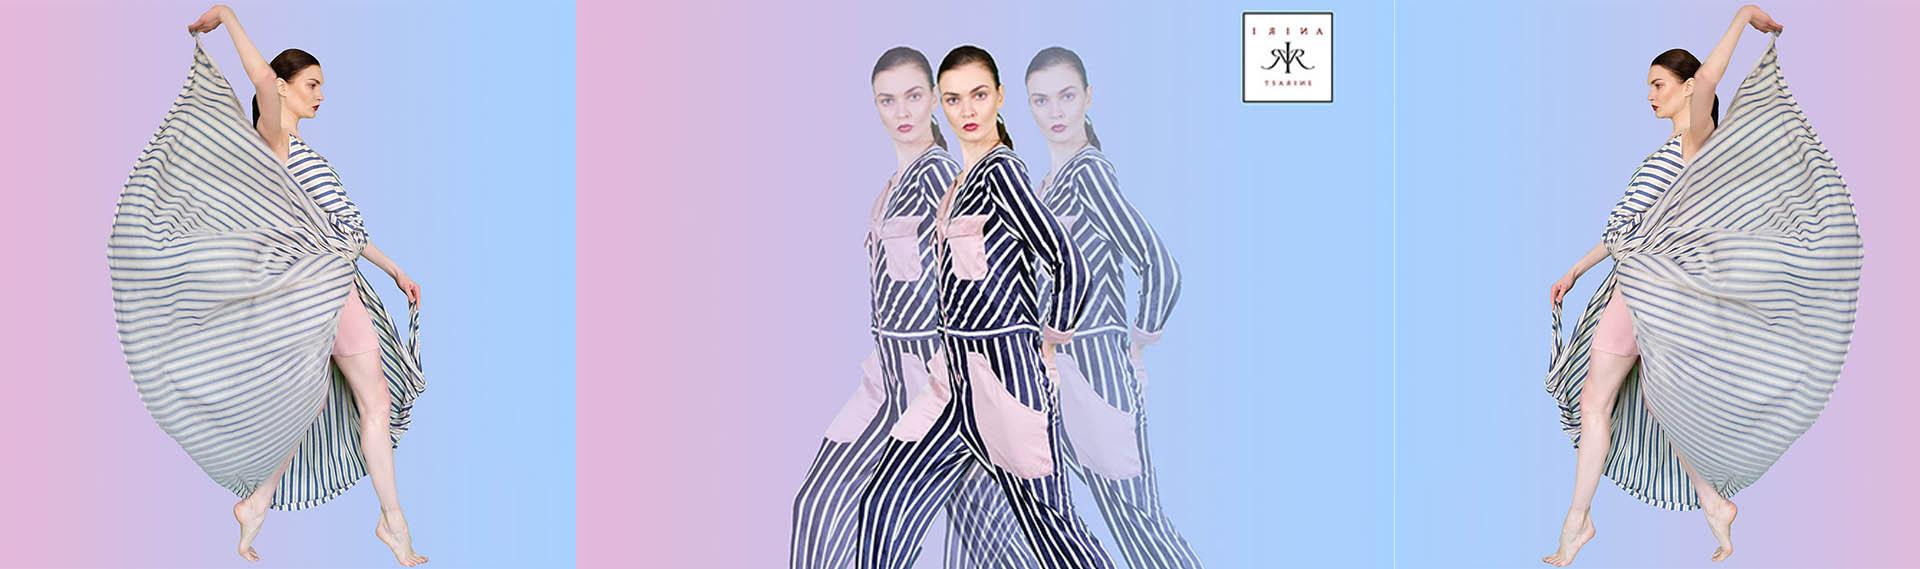 Modèles de la collection Irina Tsarine